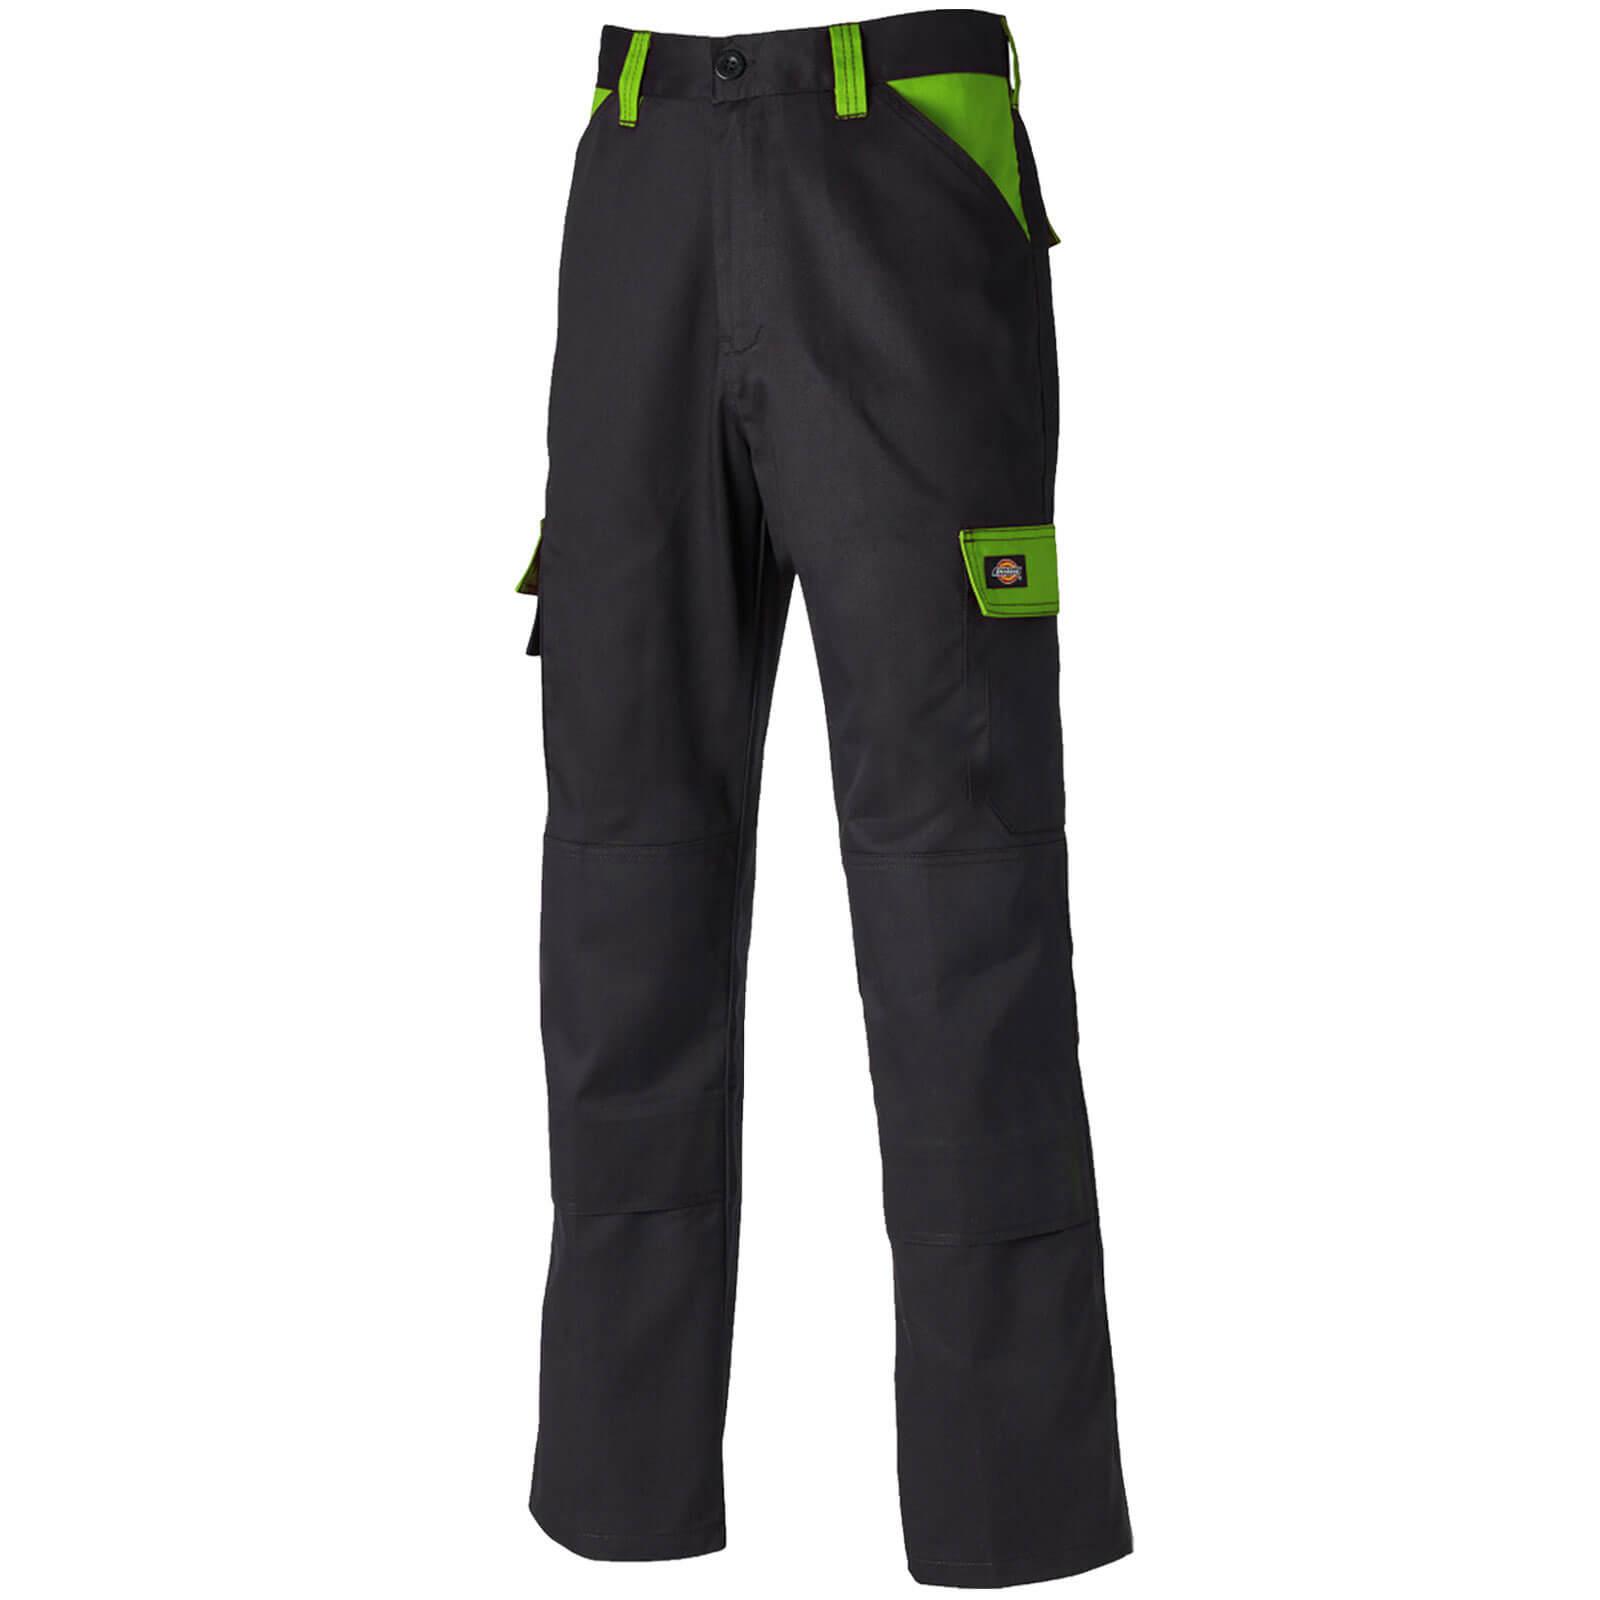 Dickies Everyday Trouser Black  Lime 34